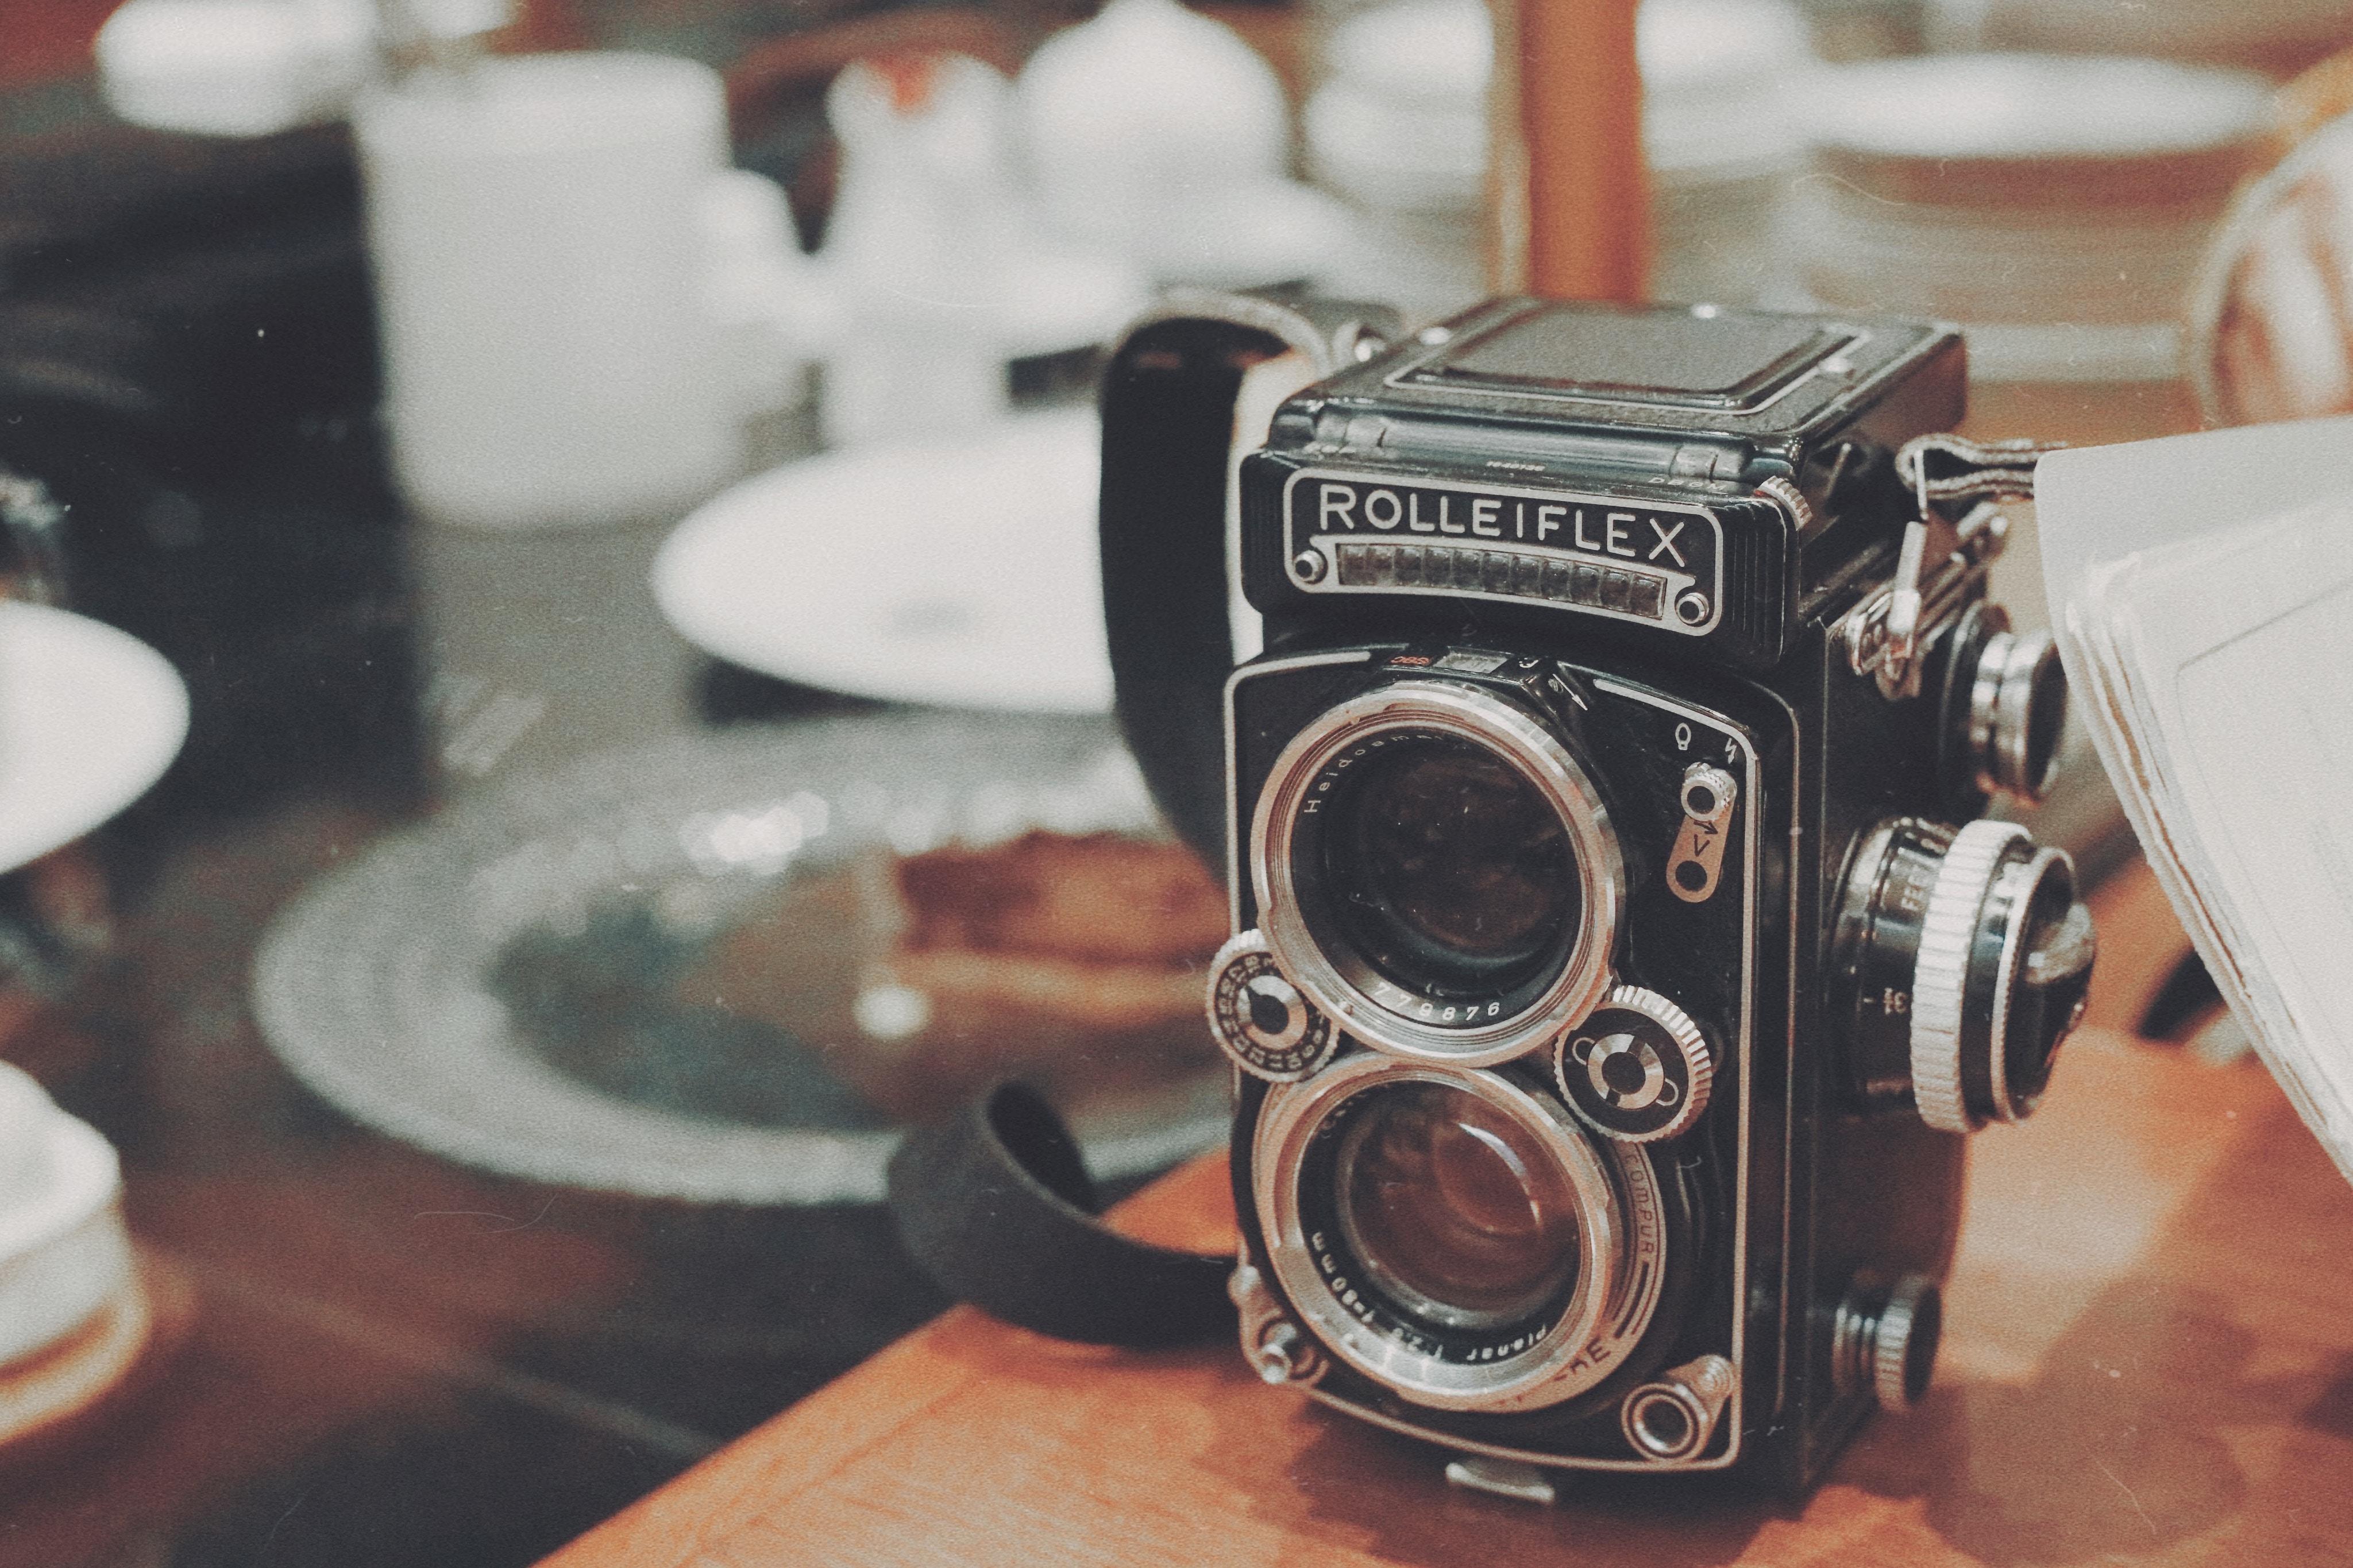 vintage black and gray Rolleiflex camera on wooden desk